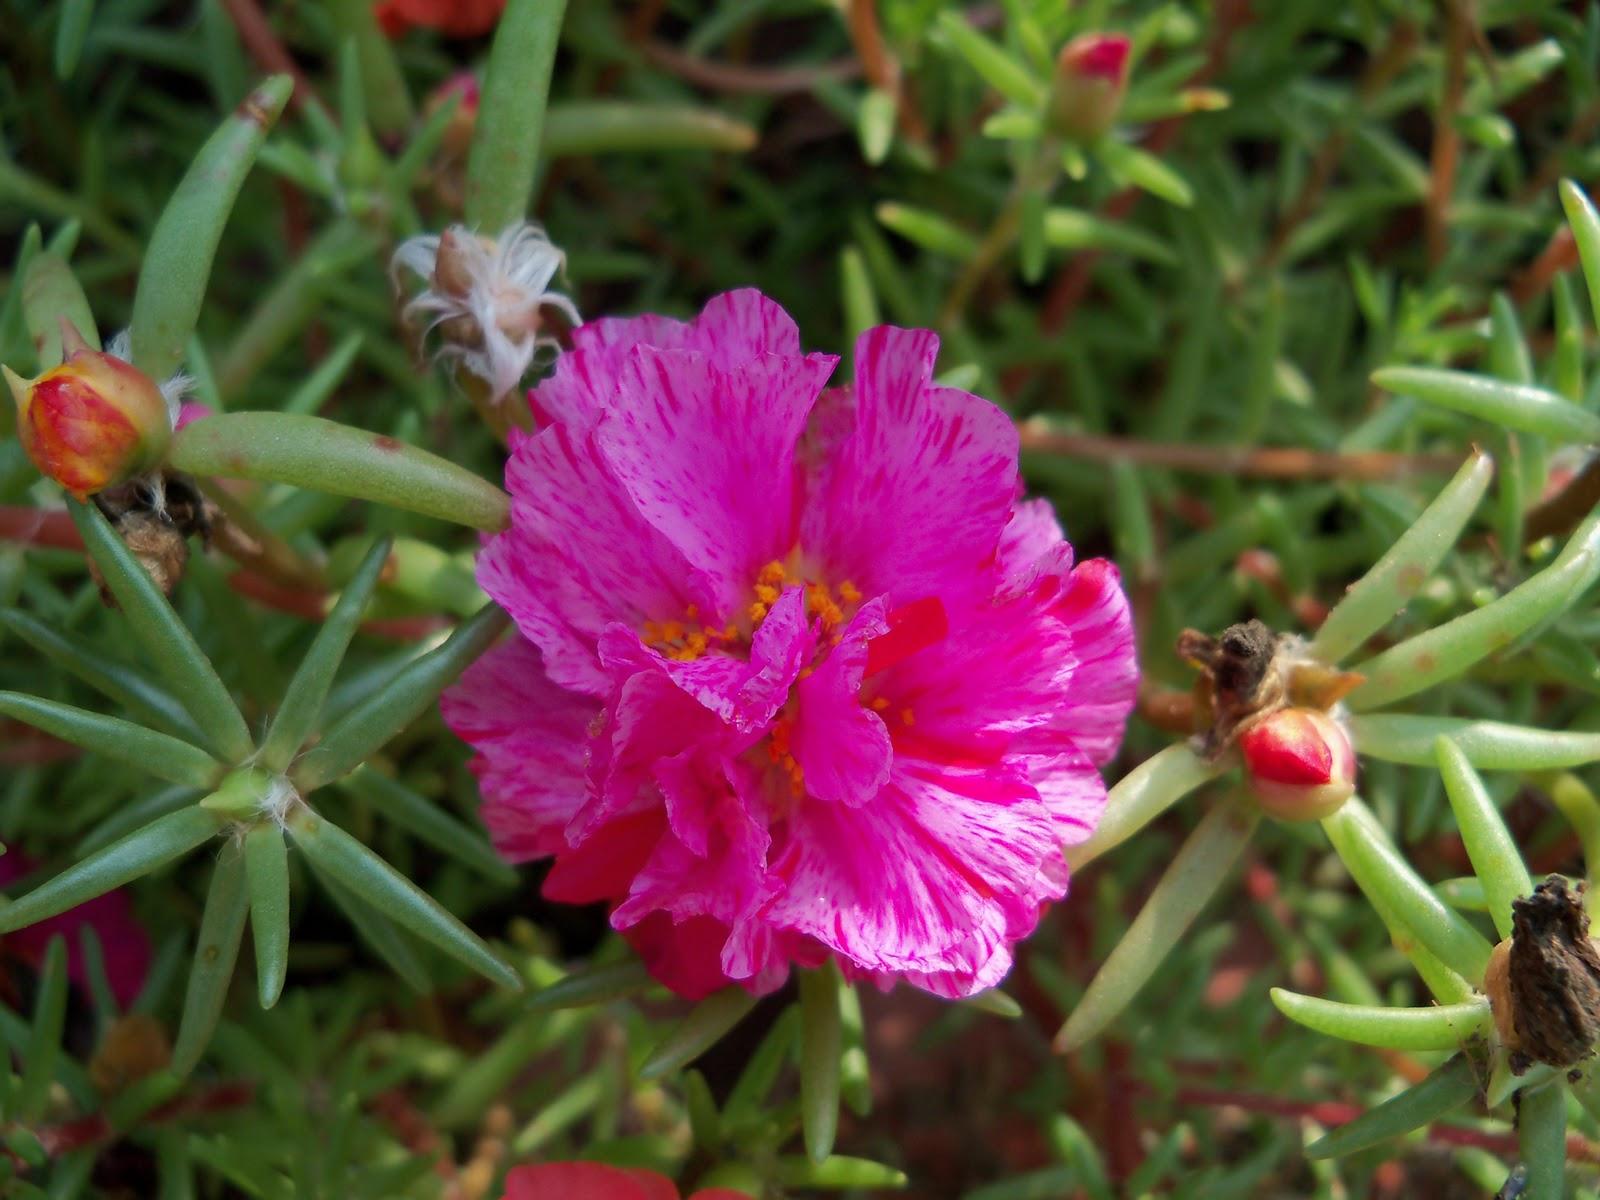 Gardening 2010, Part Two - 101_3307.JPG